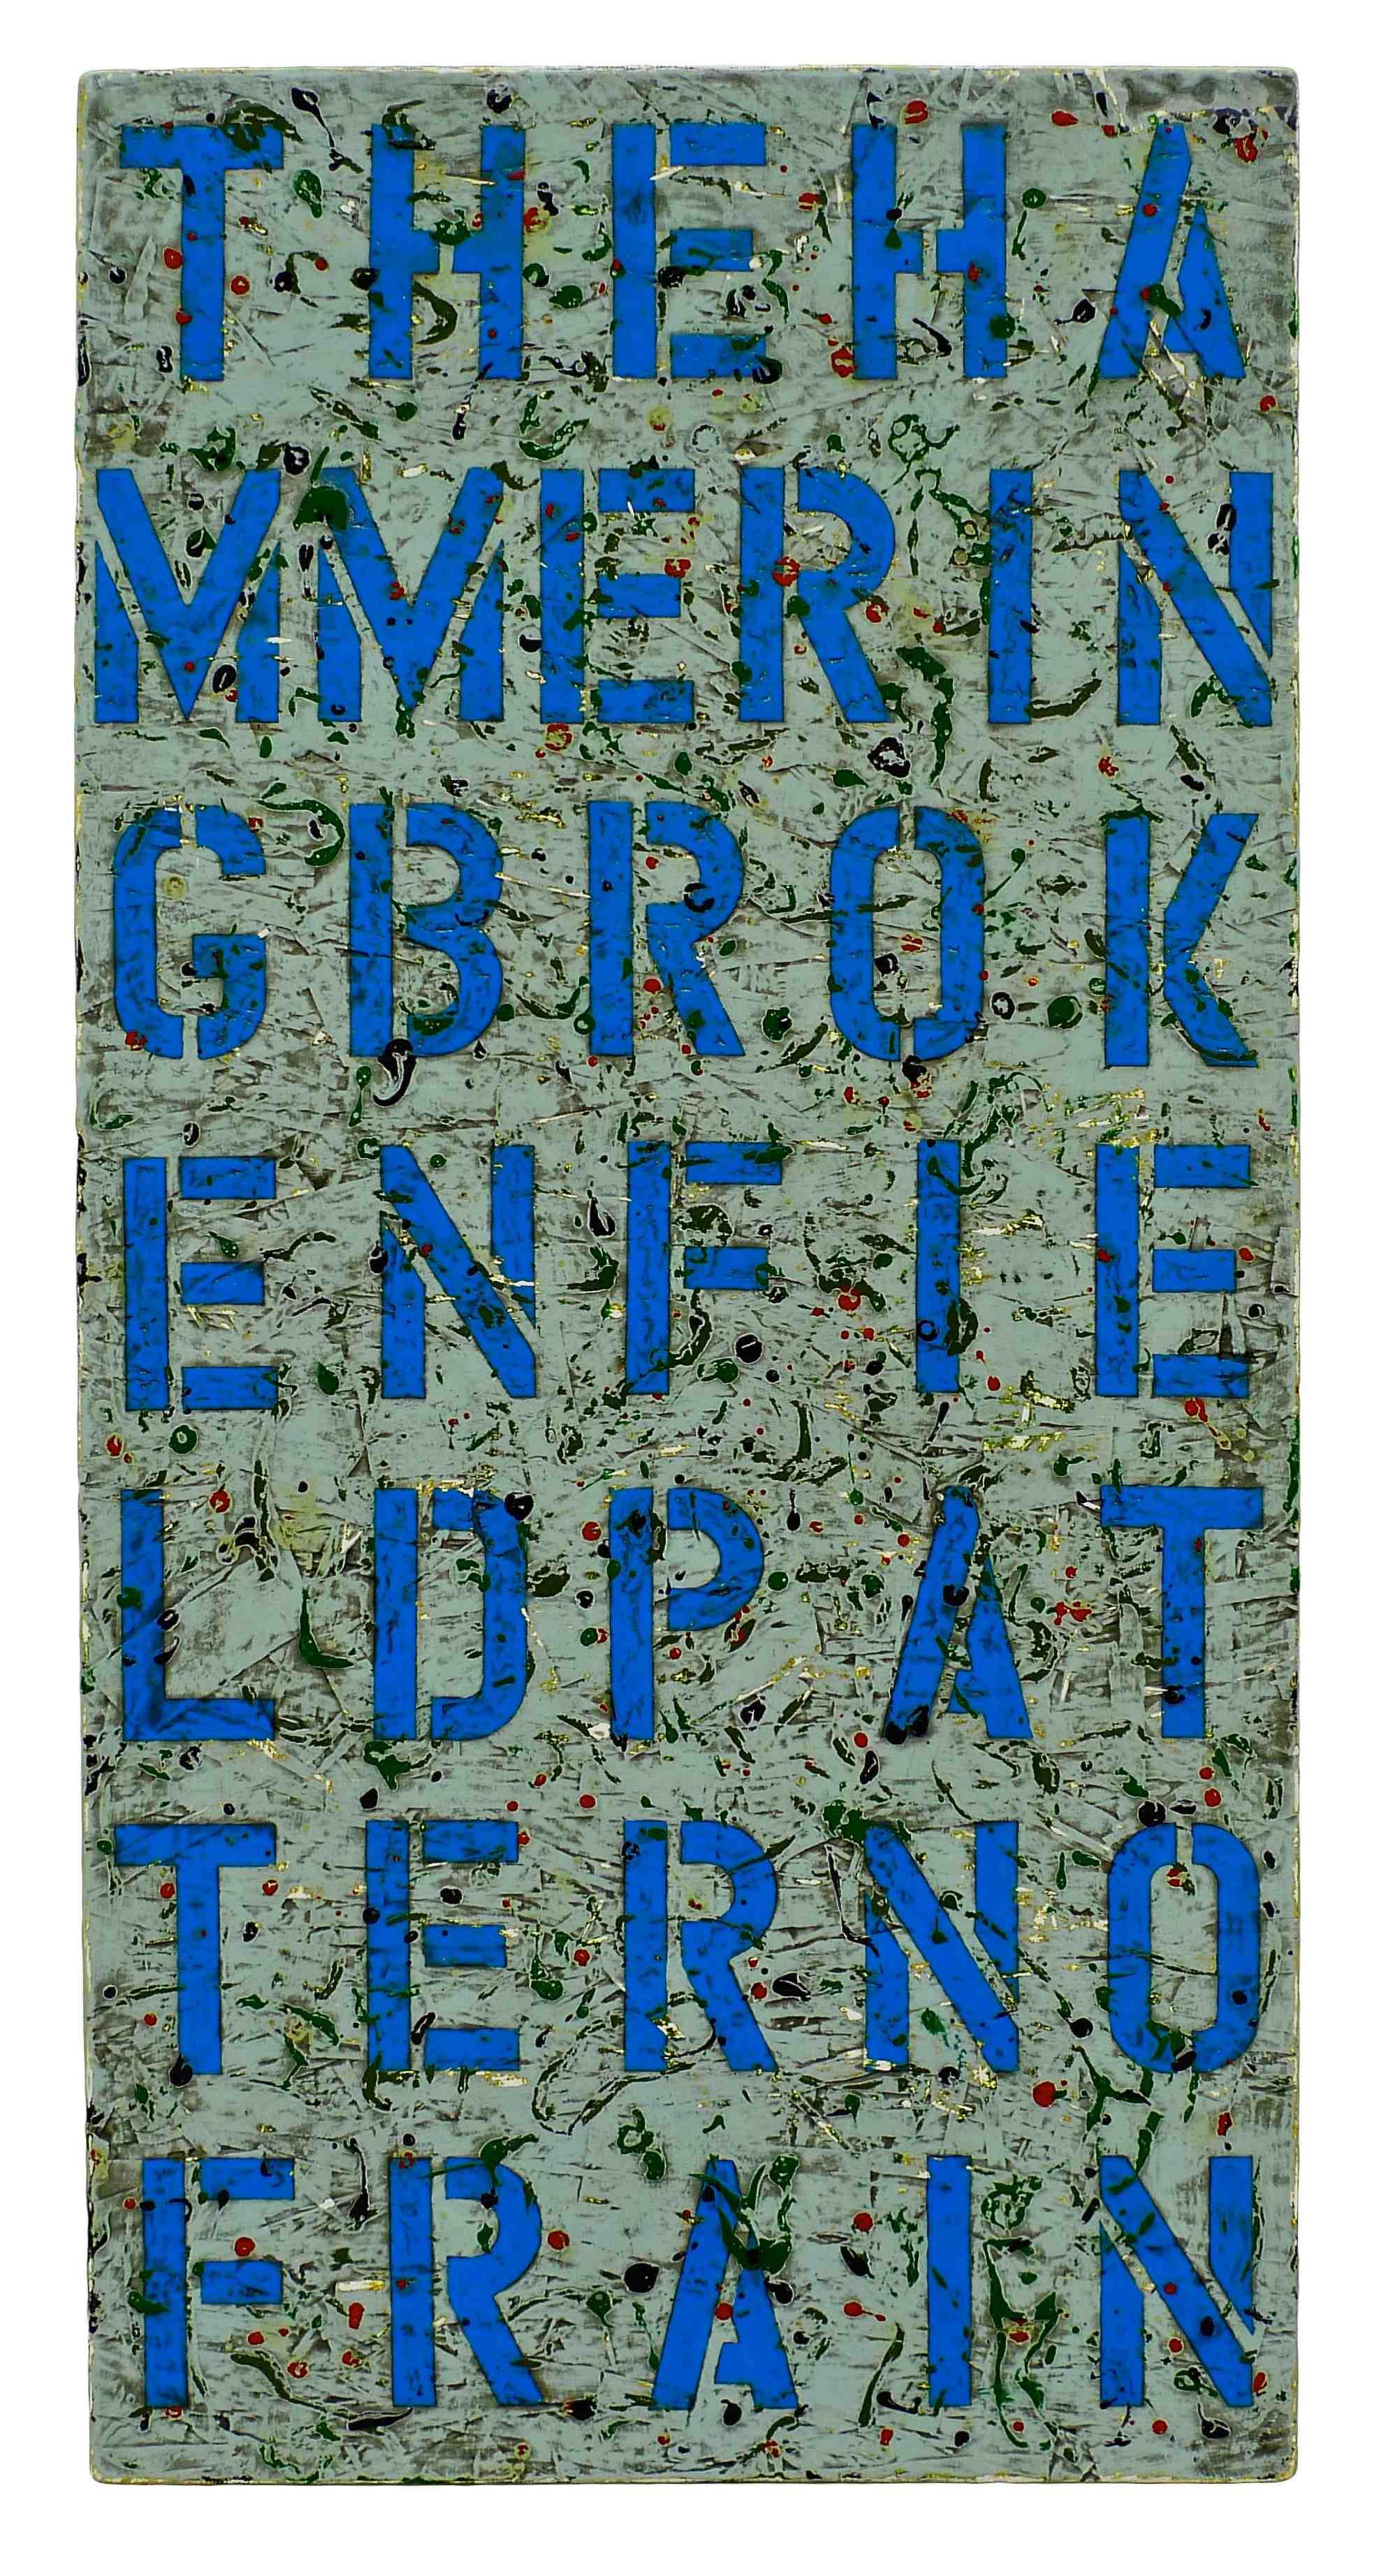 Joseph Bernard, Of Rain, 2007. Acrylic & Varnish on Wood Panel/OSB. 48 inches x 24 inches (Sold)